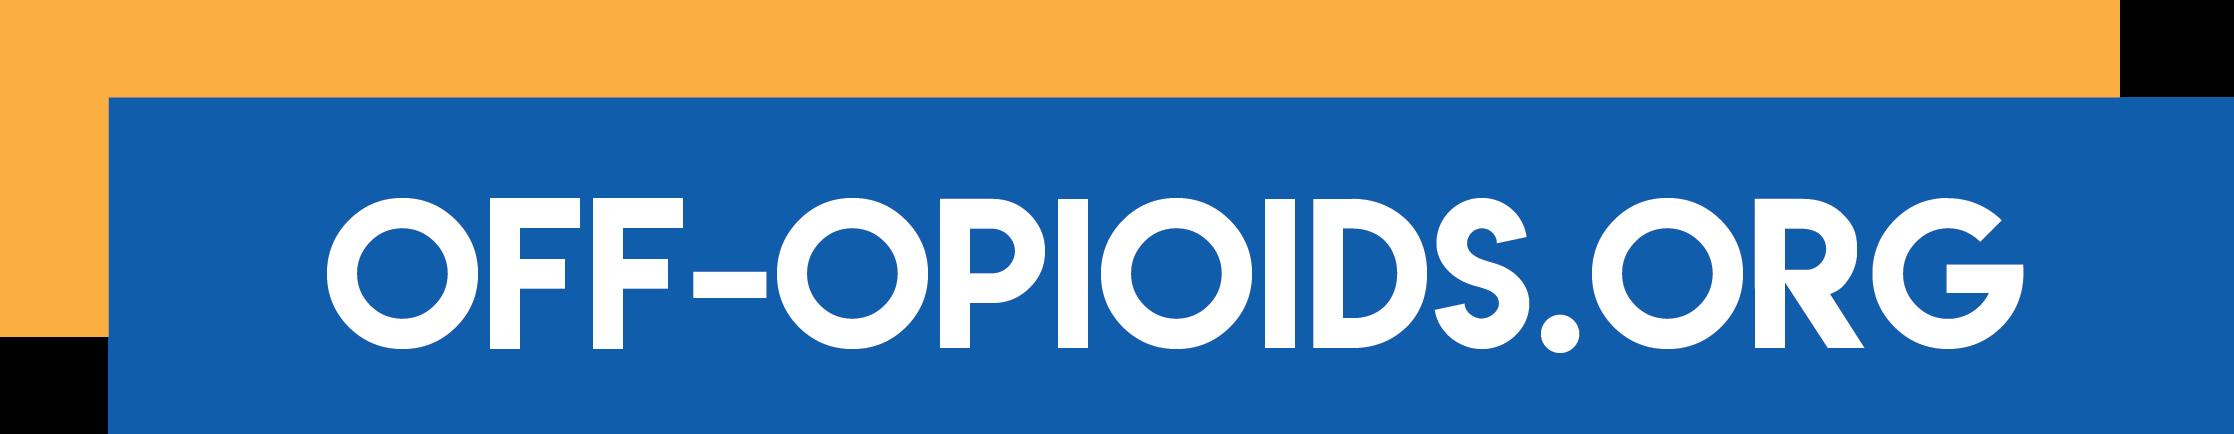 Off-Opioids.org